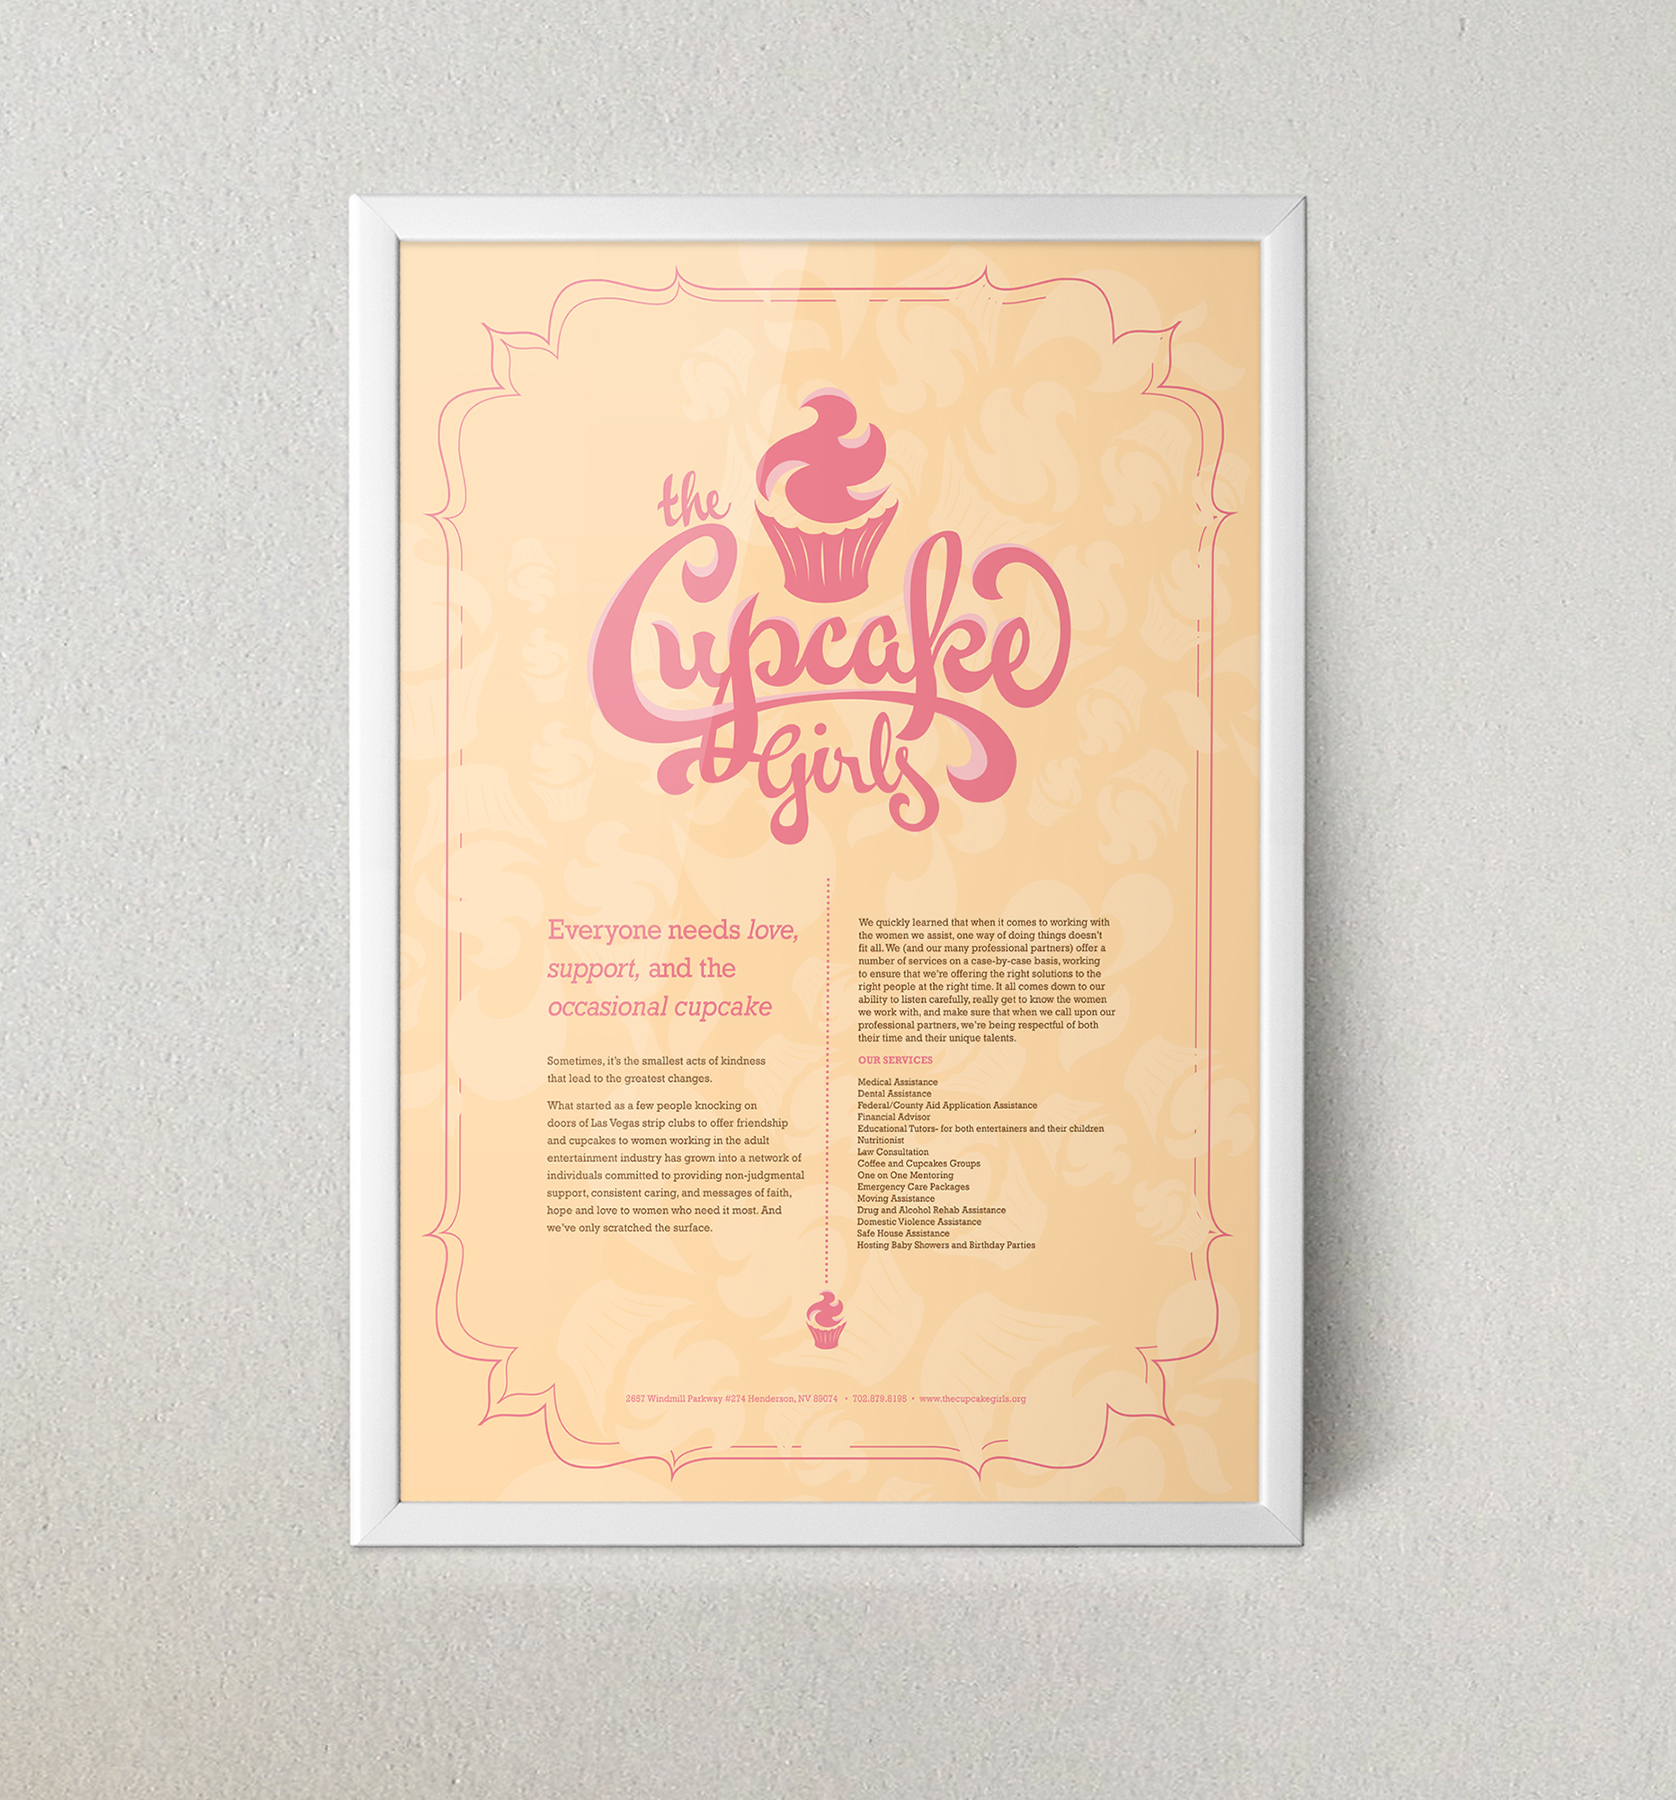 cupcake girls_poster_small.jpg